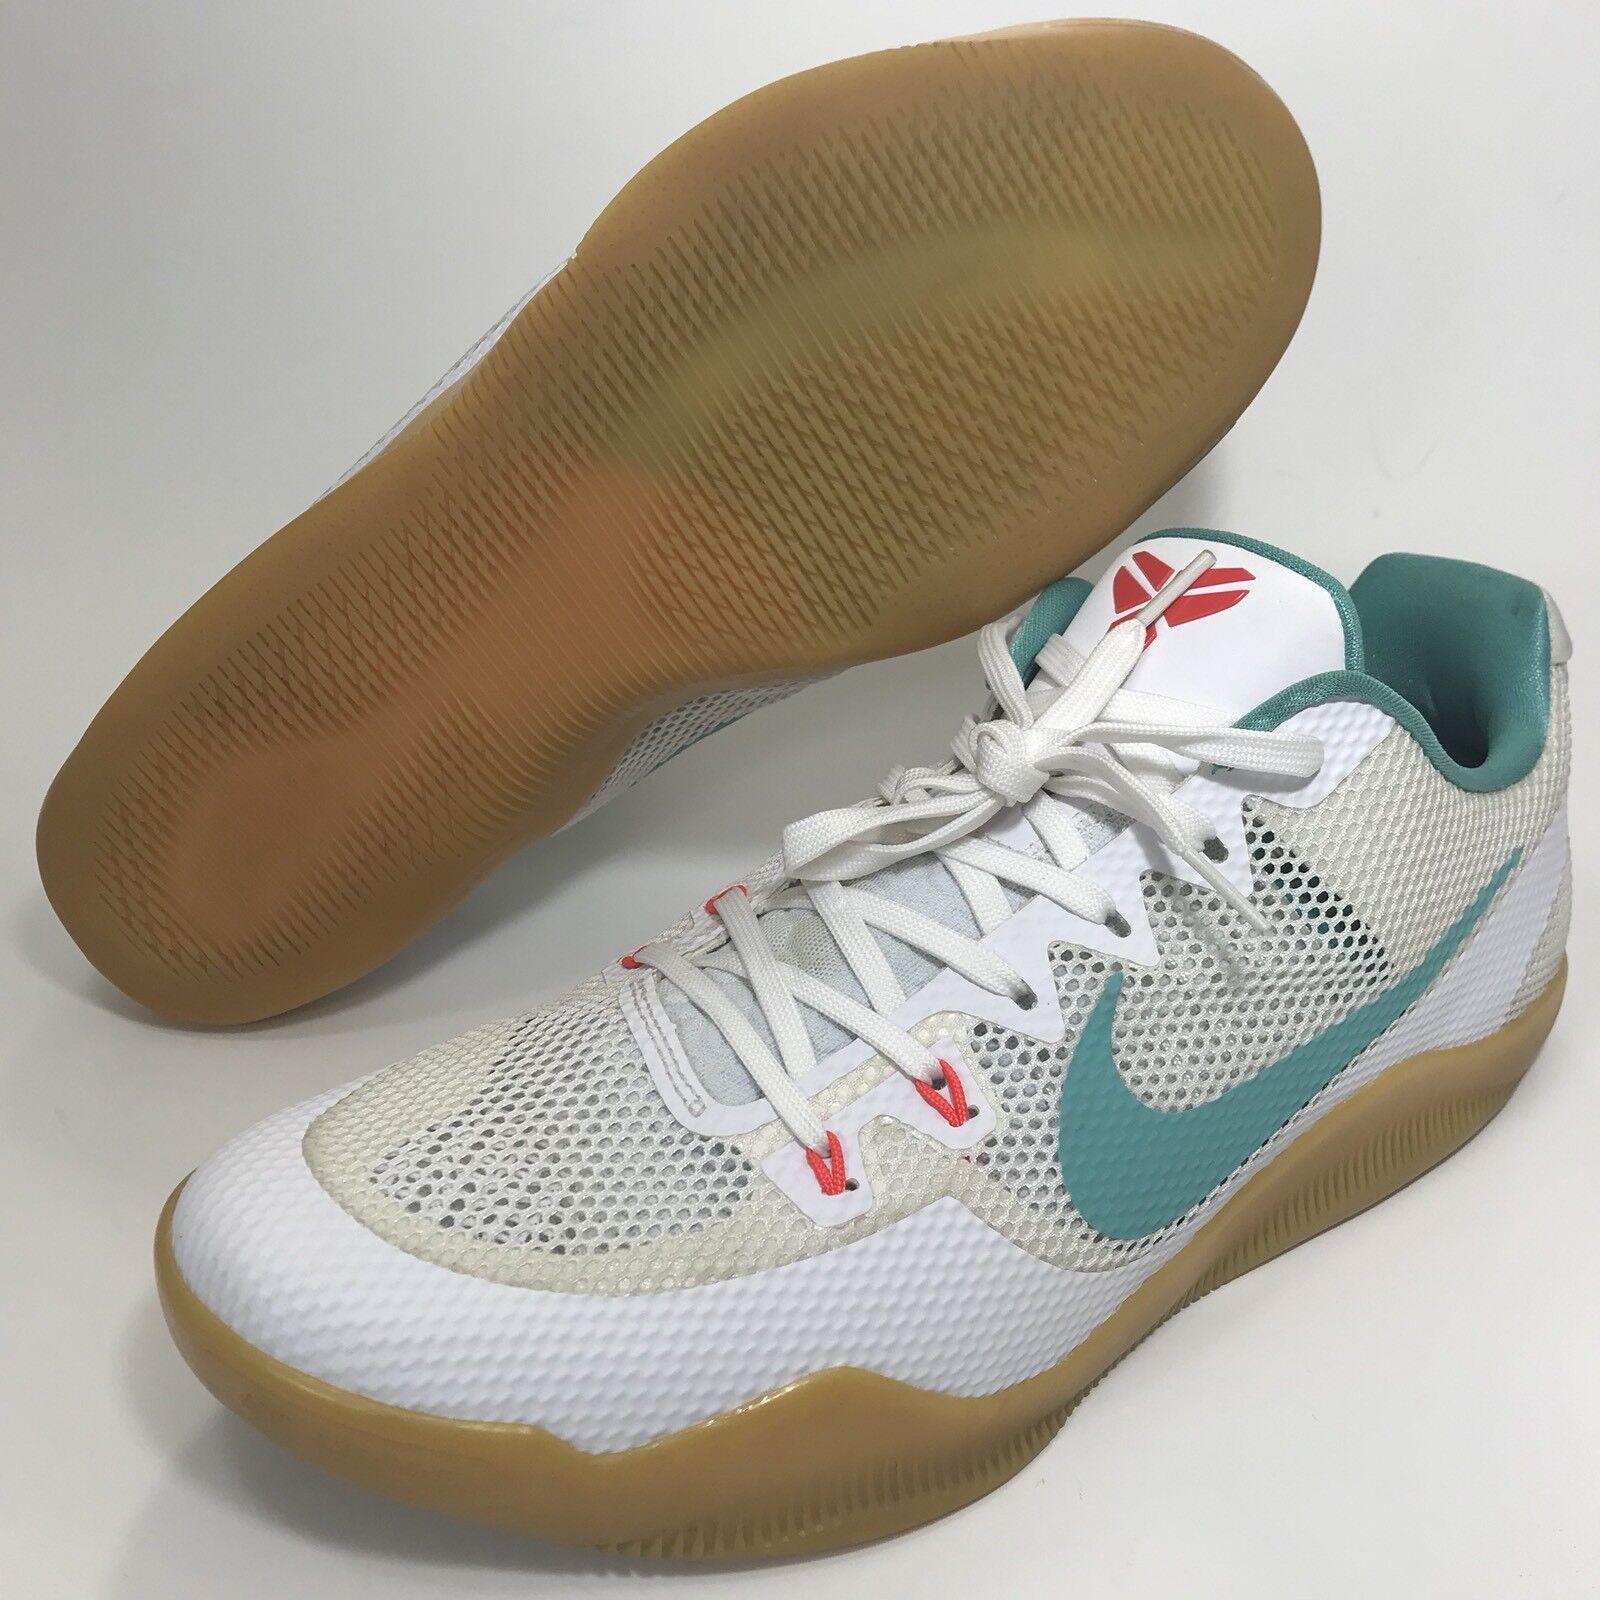 4b9caea8f0d Kobe 11 Xl White Teal Summer Pack 836183-103 Men's Size 14 Nike Gum ...